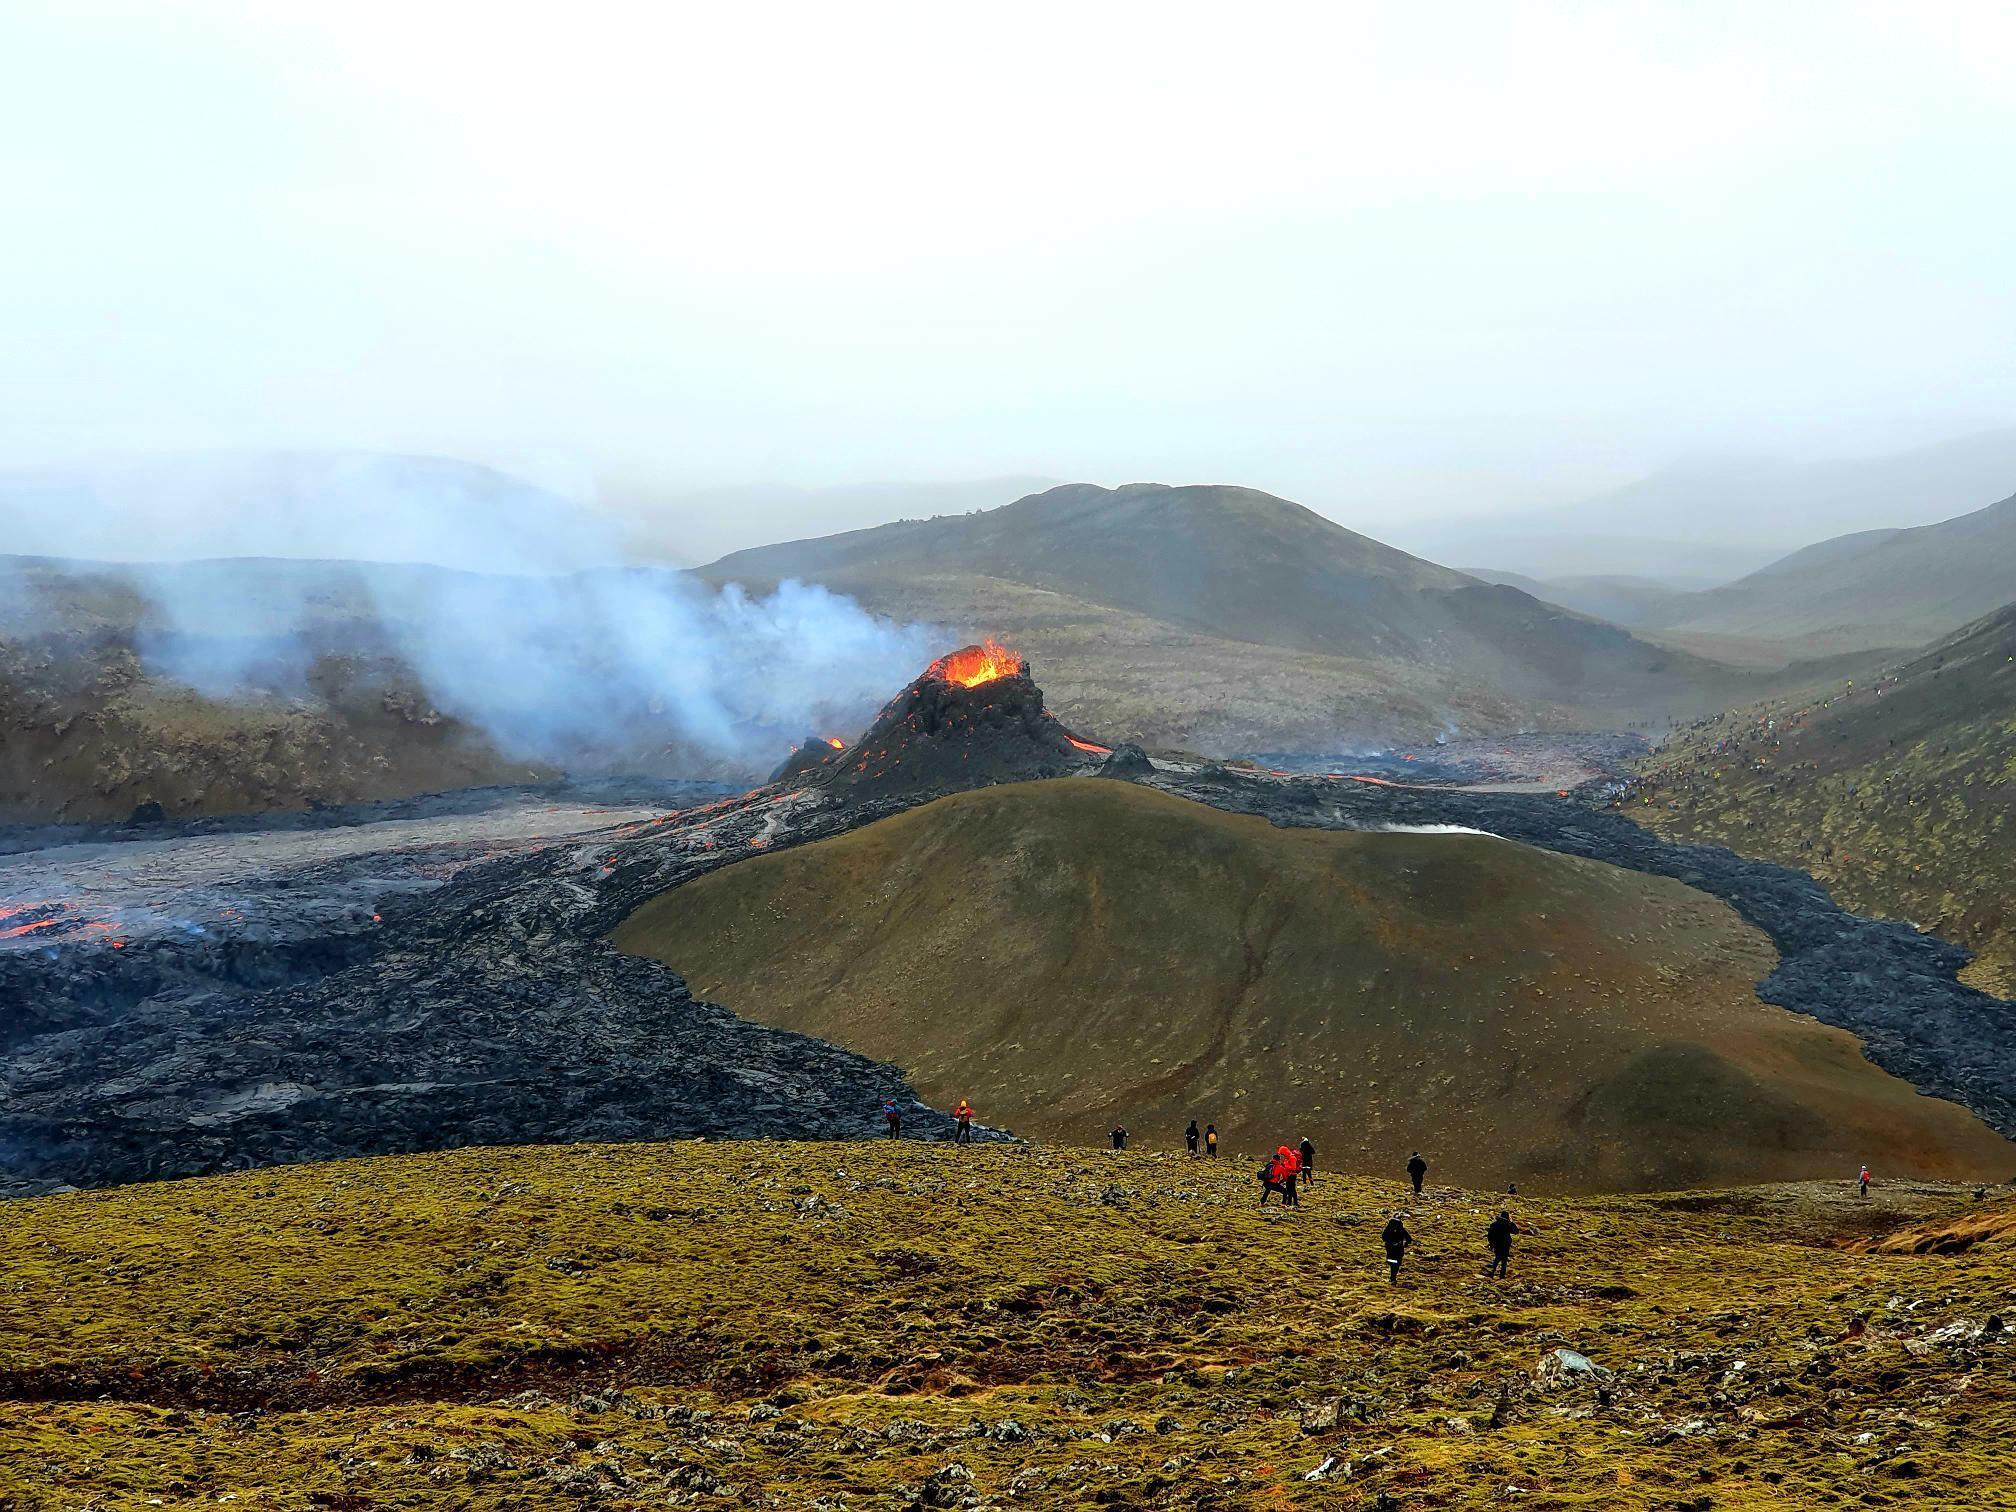 the tower of Fagradalsfjall volcano with smoke